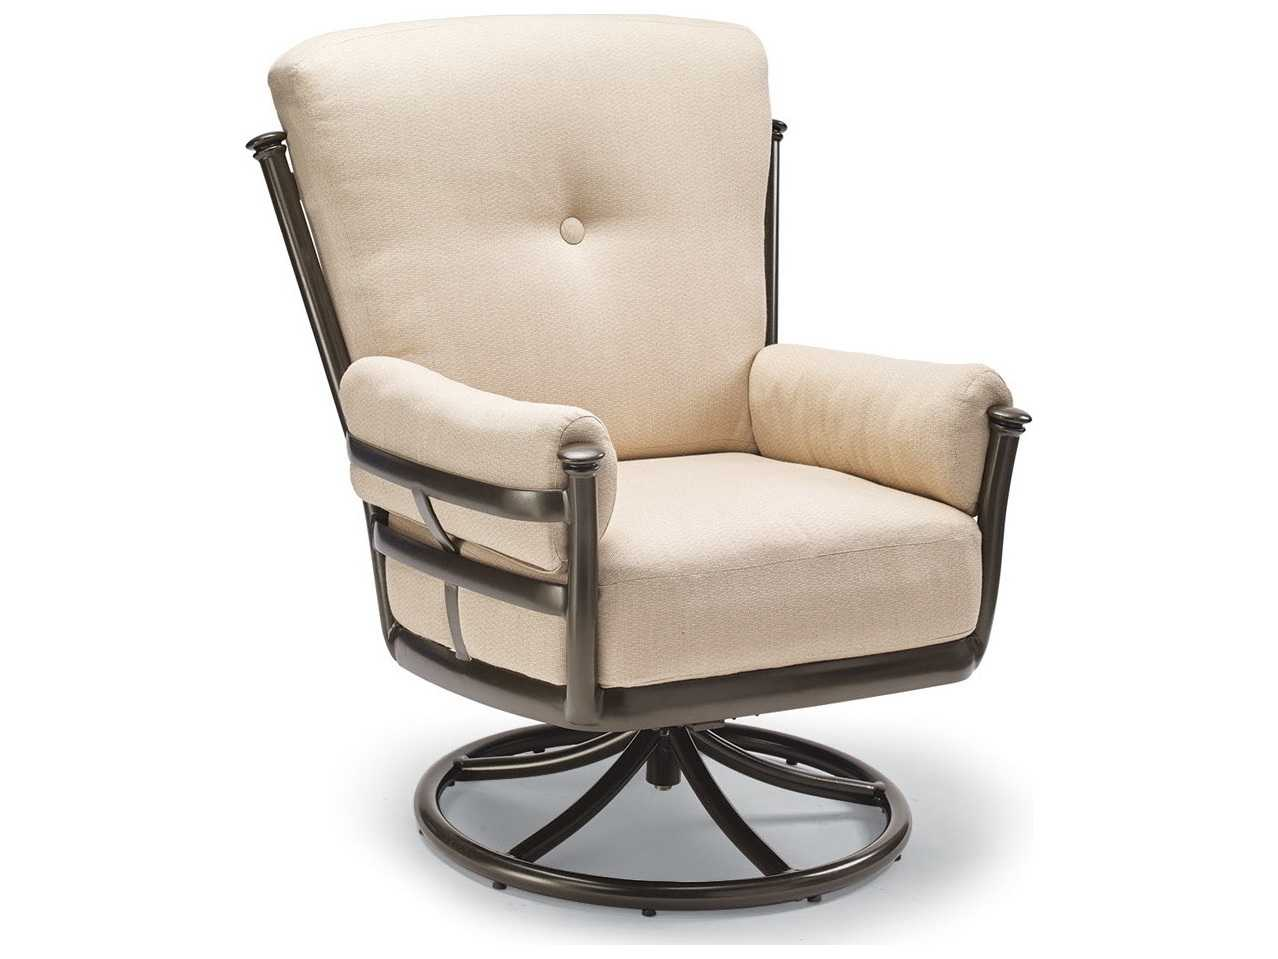 aluminum lounge chairs big kahuna beach chair winston catania cushion ultra swivel tilt